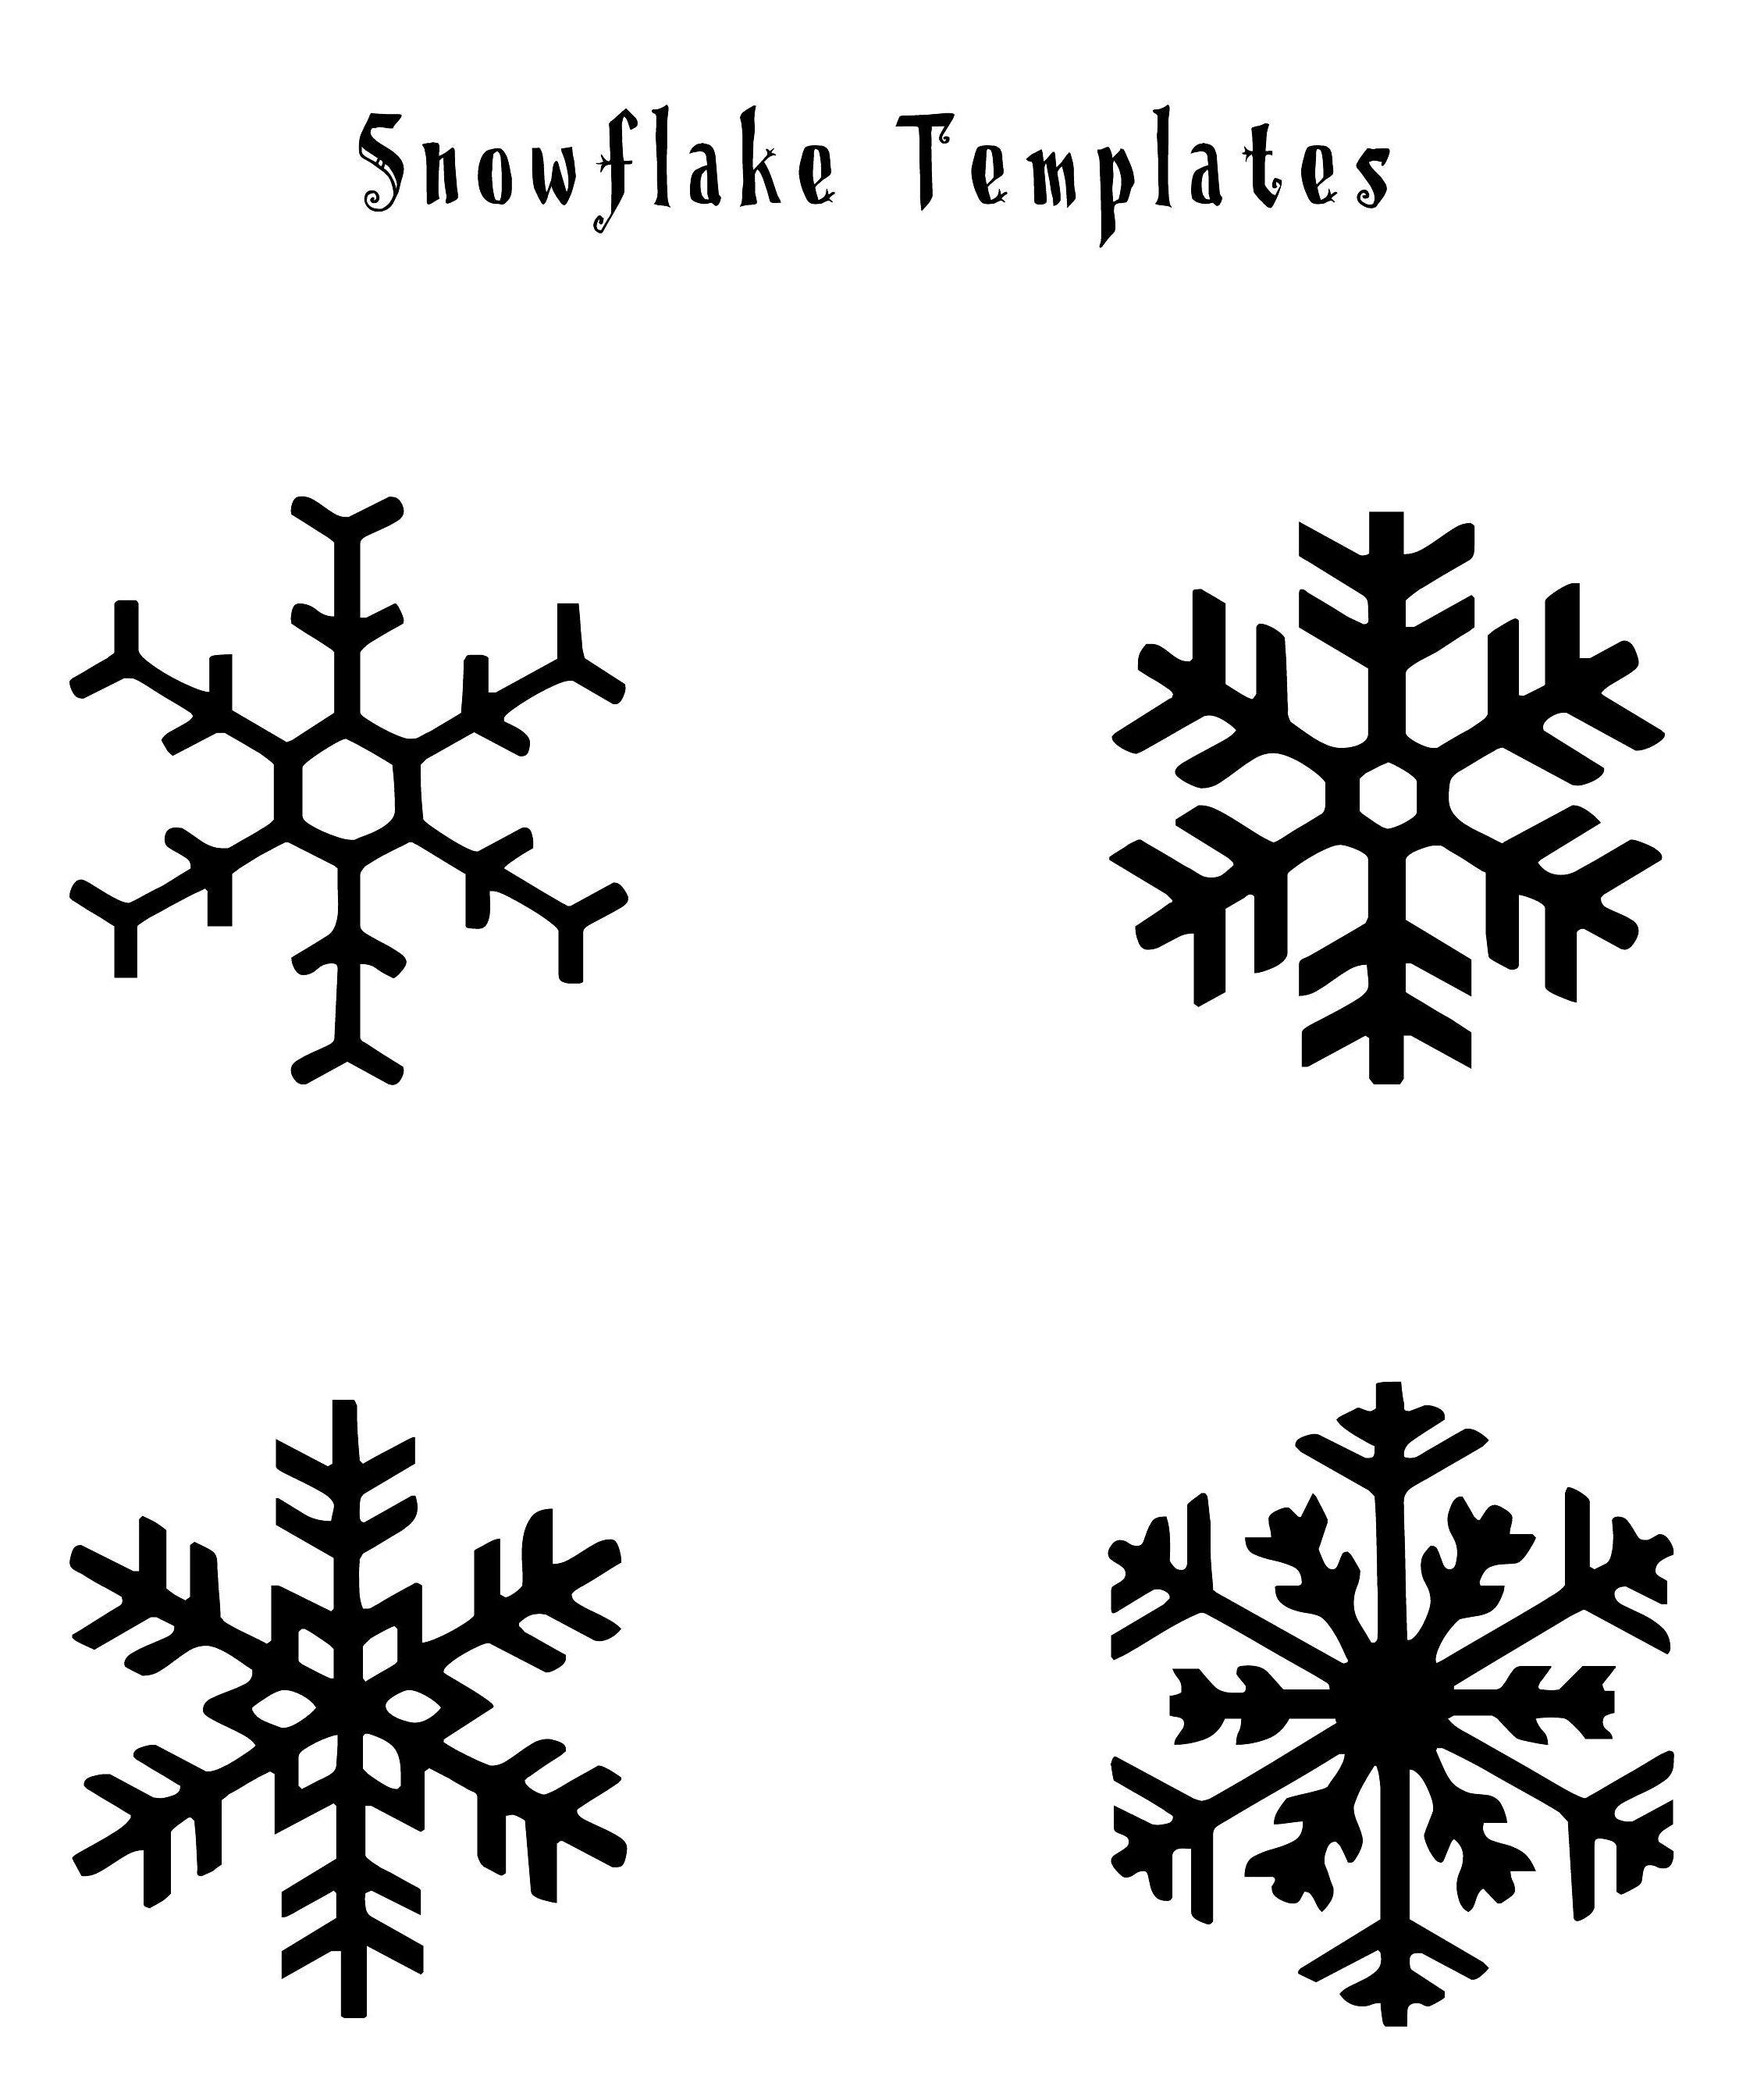 snowflake method template - free printable snowflake templates google search 1st